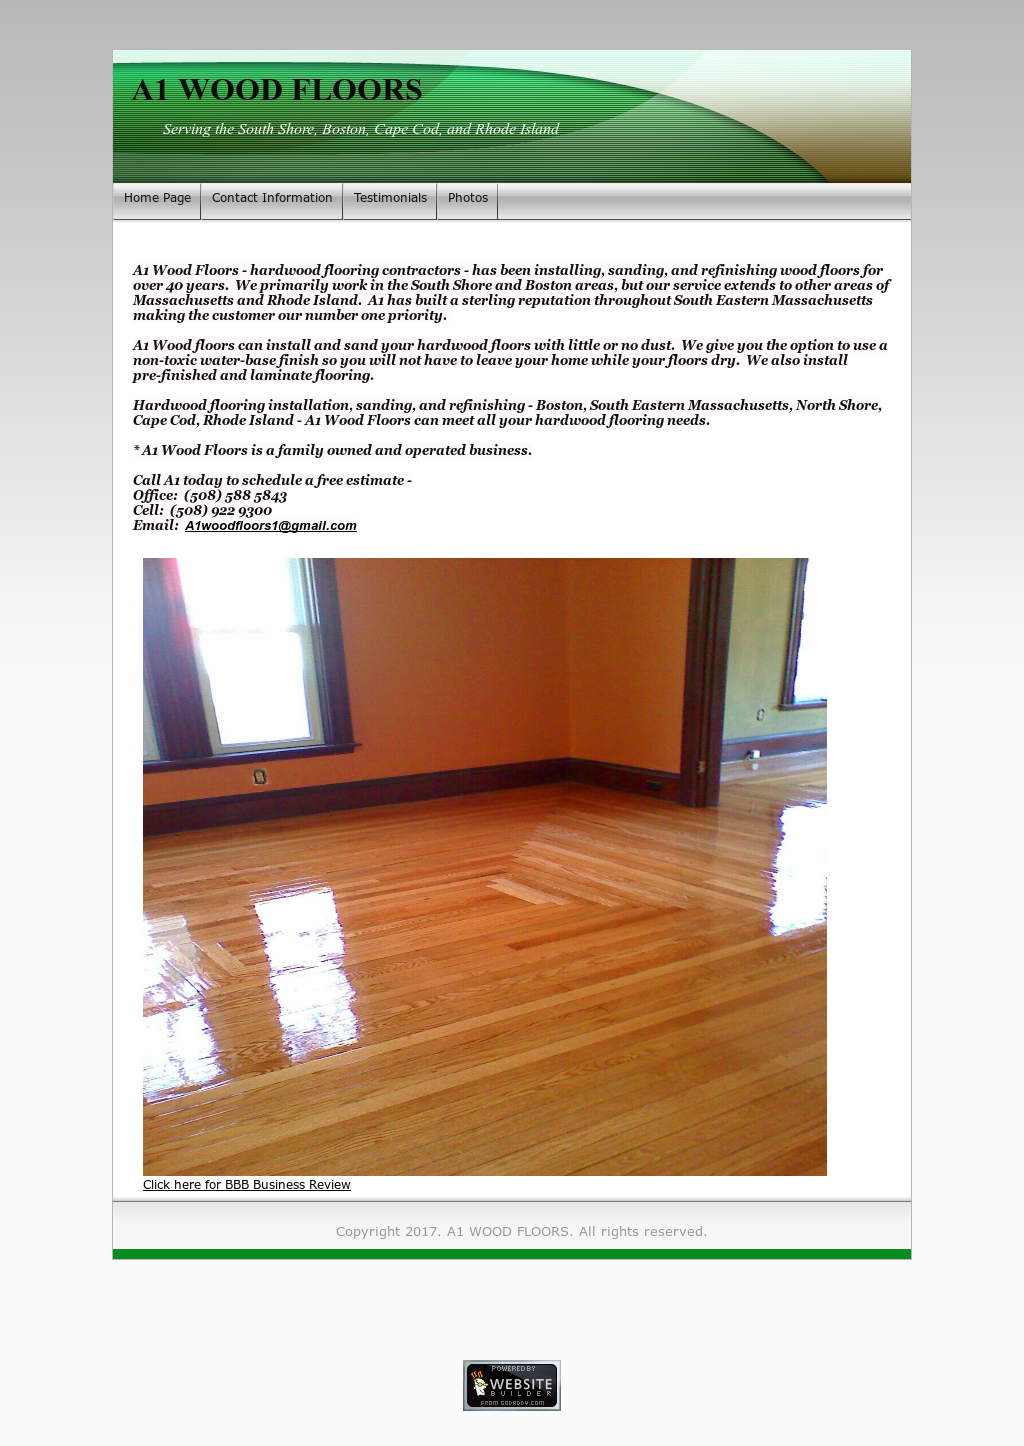 A1 Wood Floors Website History